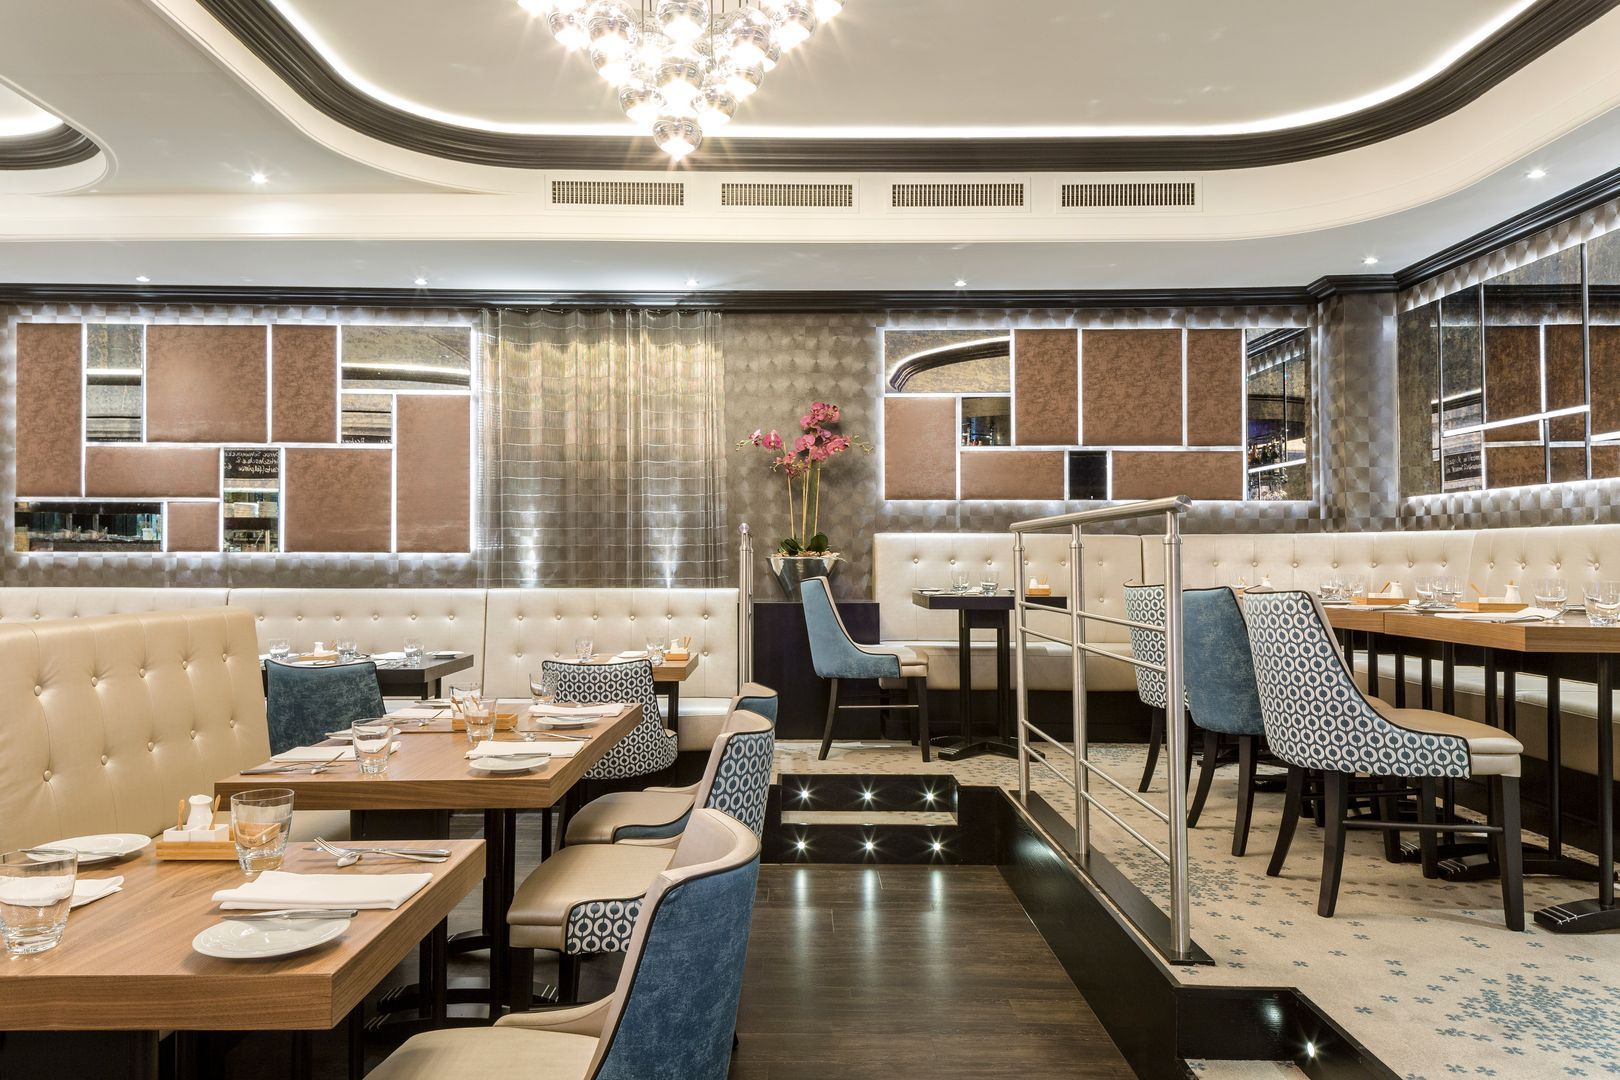 restaurant victorian eventlocation fiylo. Black Bedroom Furniture Sets. Home Design Ideas